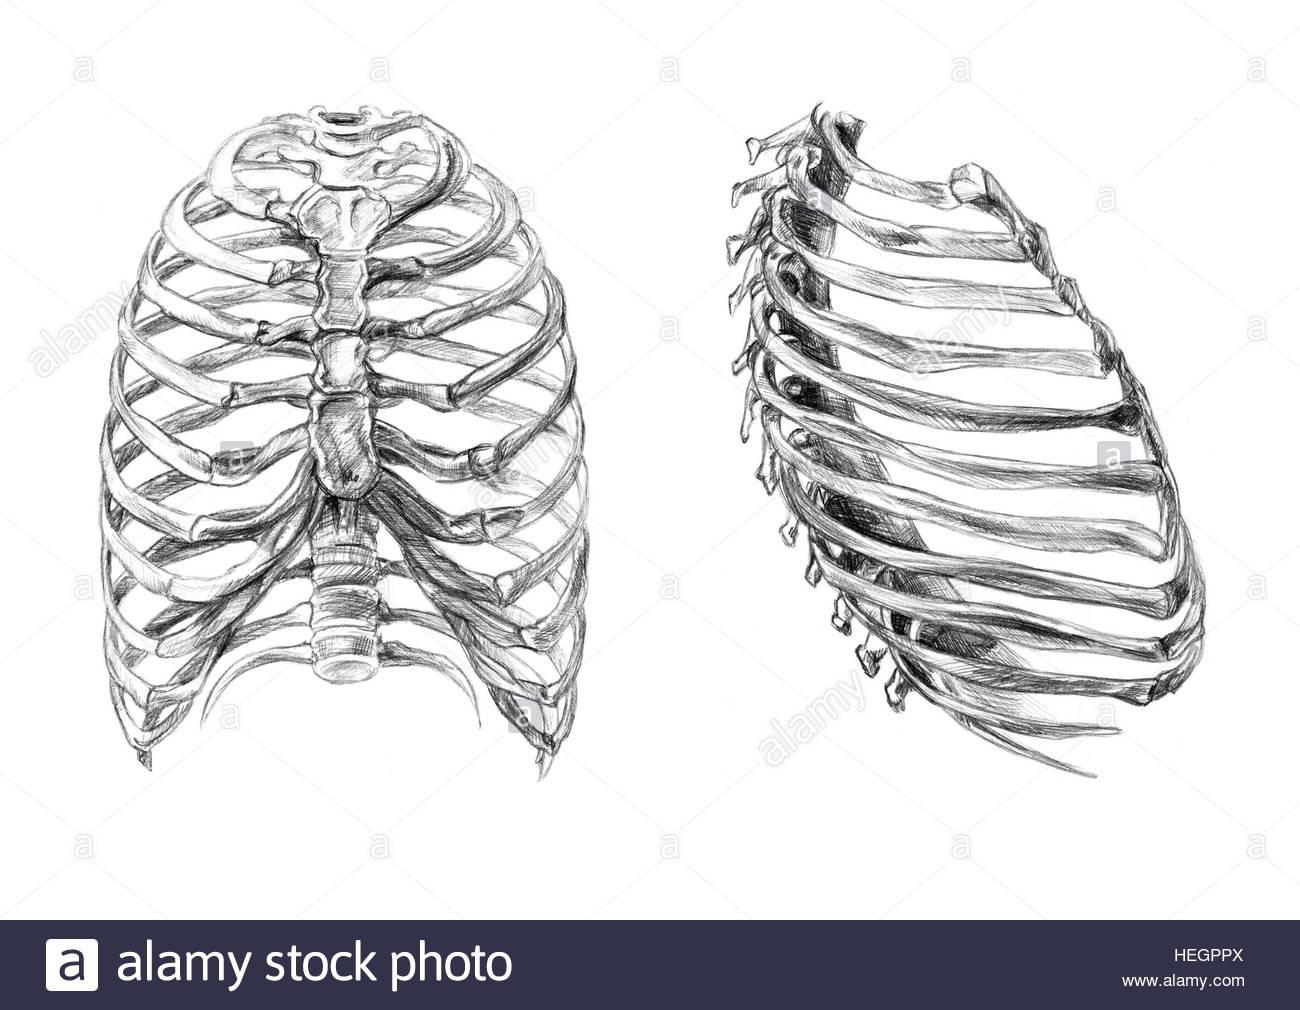 1300x1010 Thorax Bones (2 Angles), Hand Drawn Medical Illustration Drawing